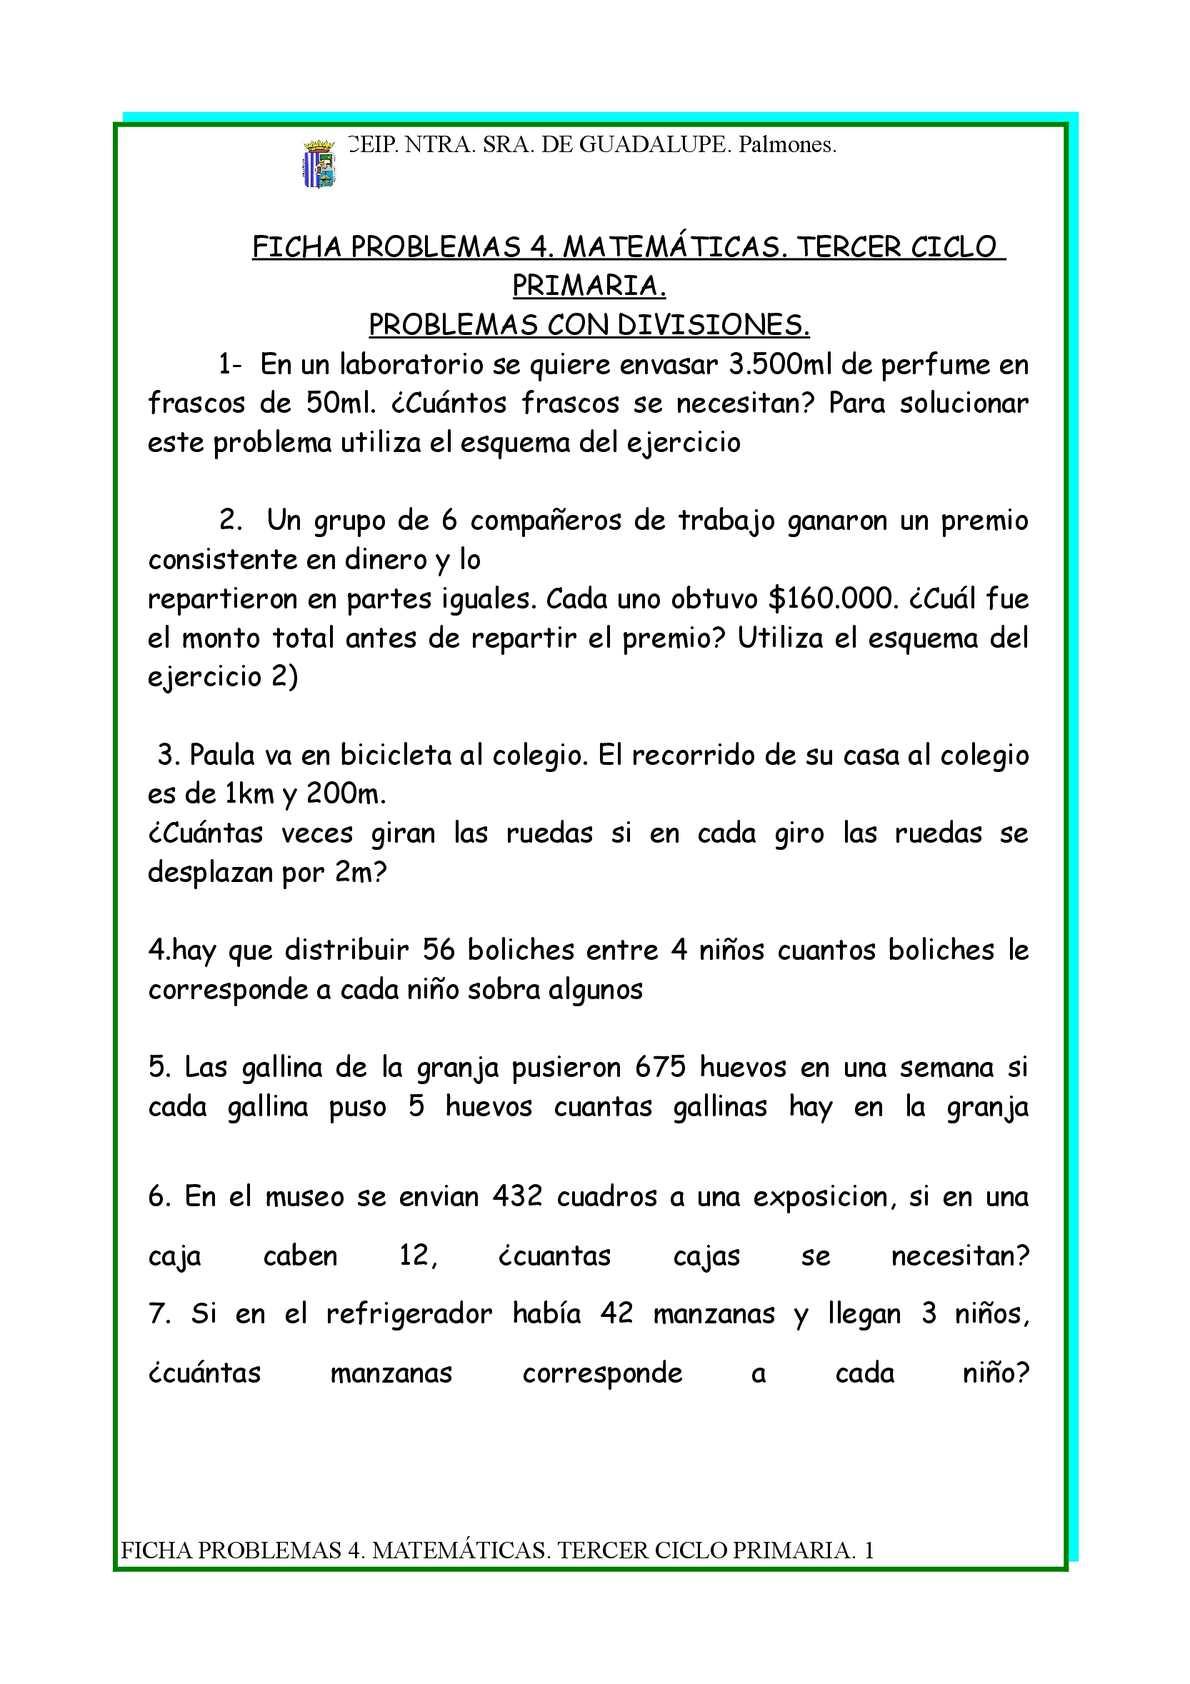 Calaméo - FICHAS PROBLEMAS 4. MATEMÁTICAS. TERCER CICLO PRIMARIA ...